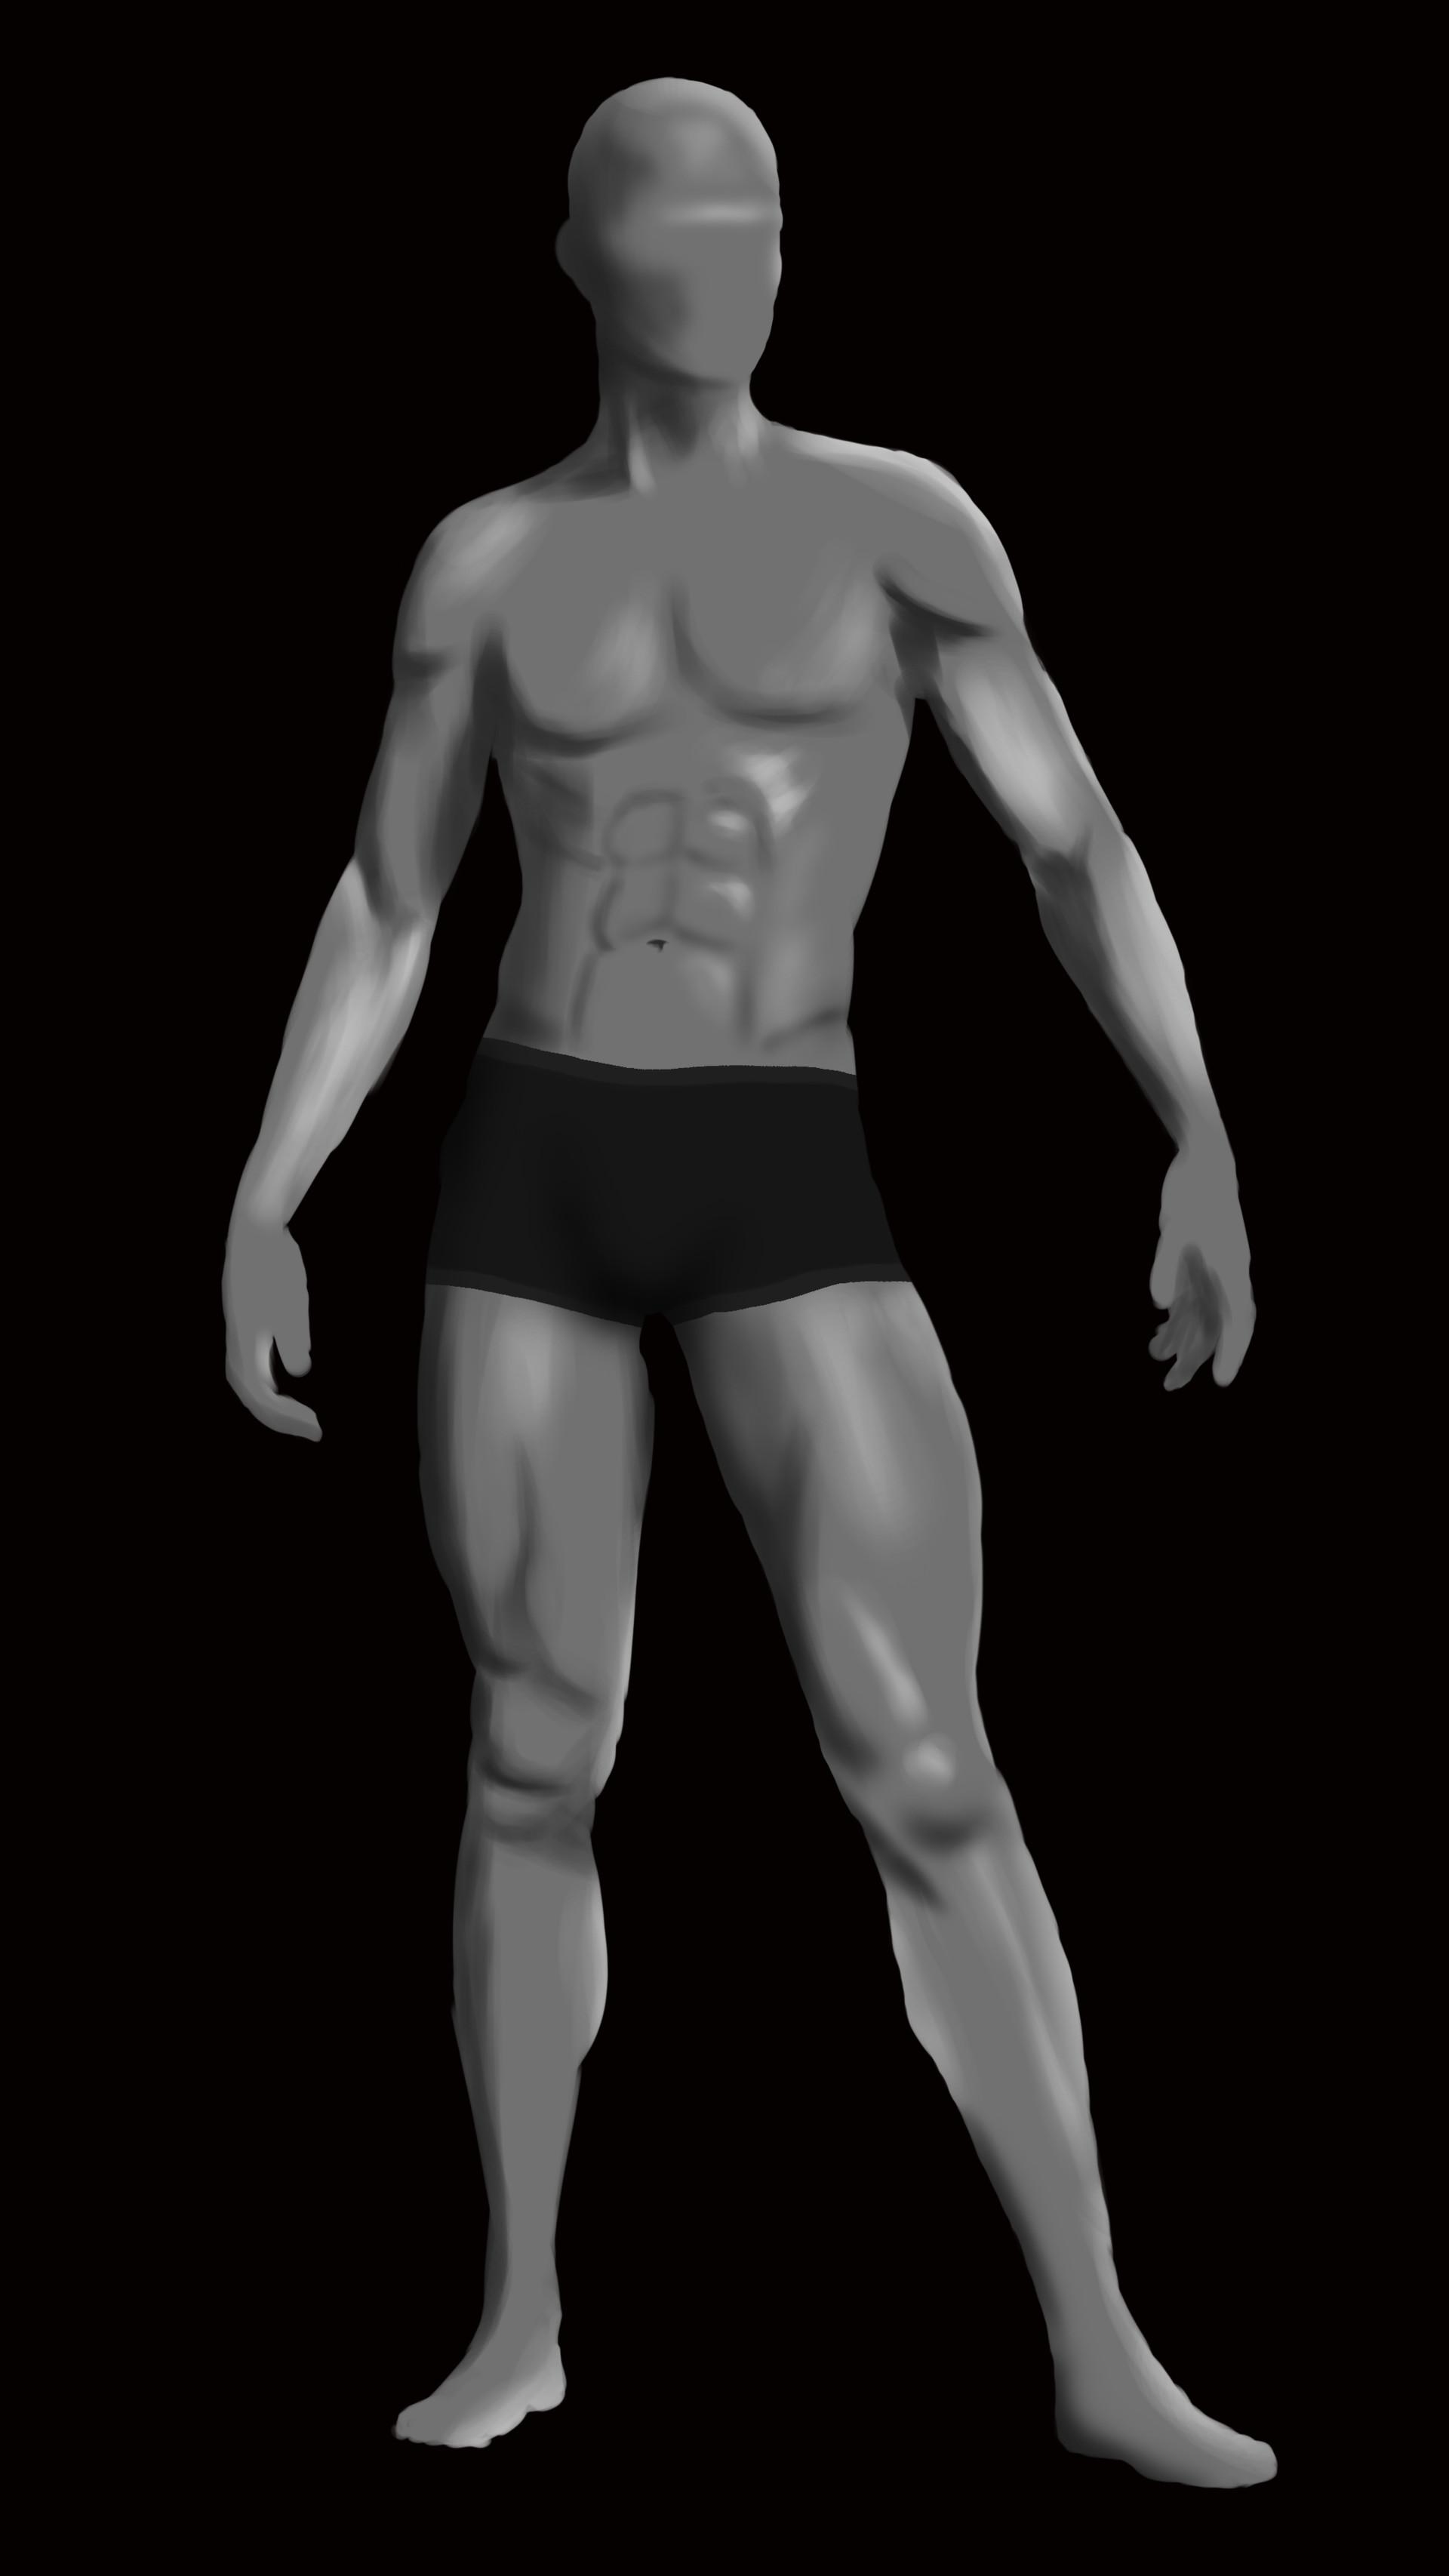 Stephen Atkinson - Anatomy guy